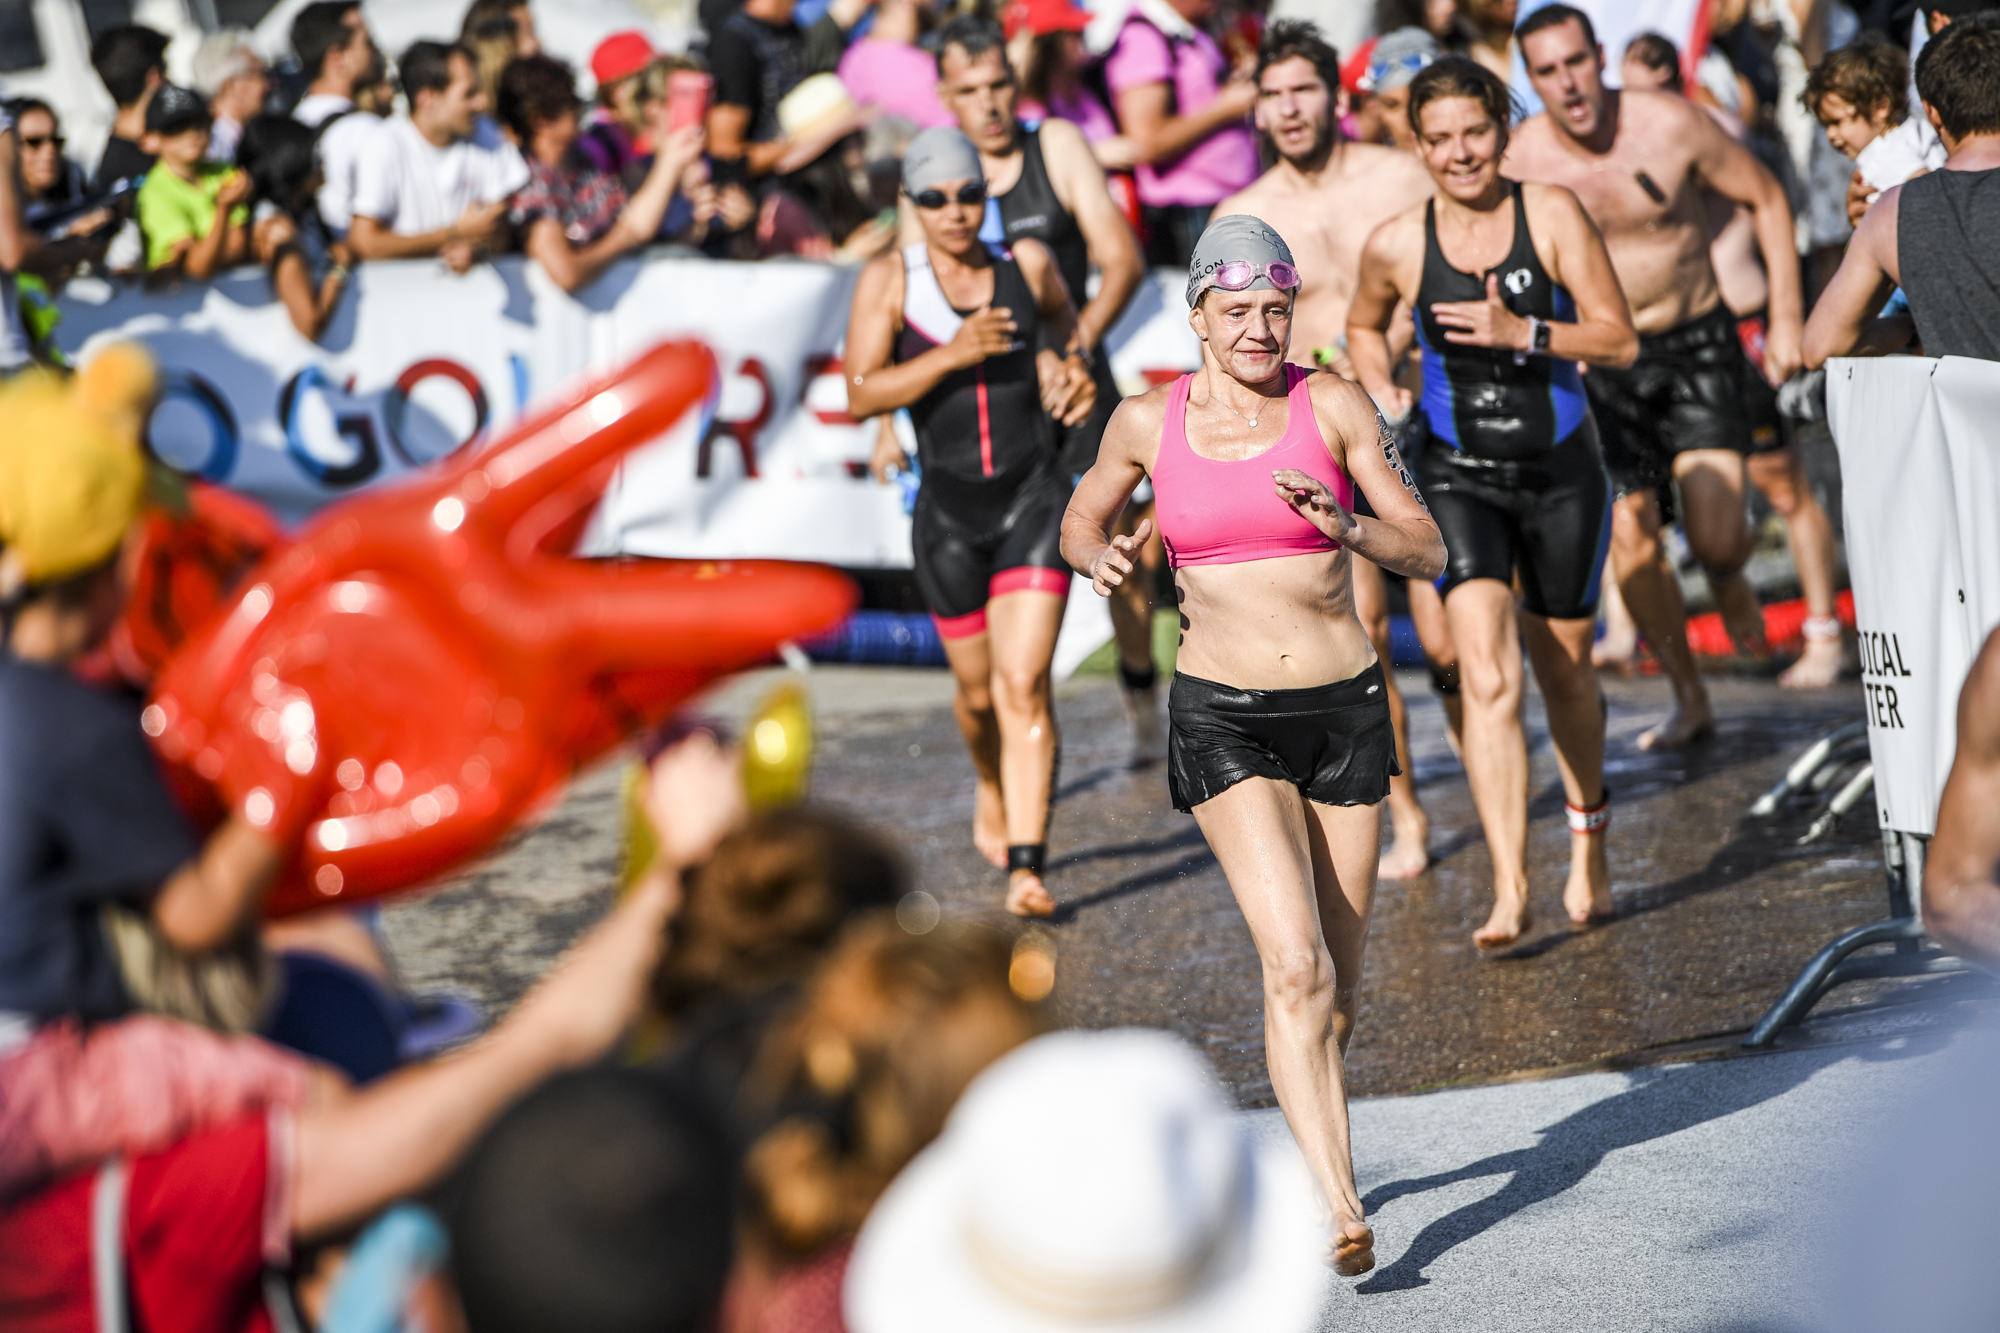 Final stretch before the 31st edition of the La Tour Genève Triathlon